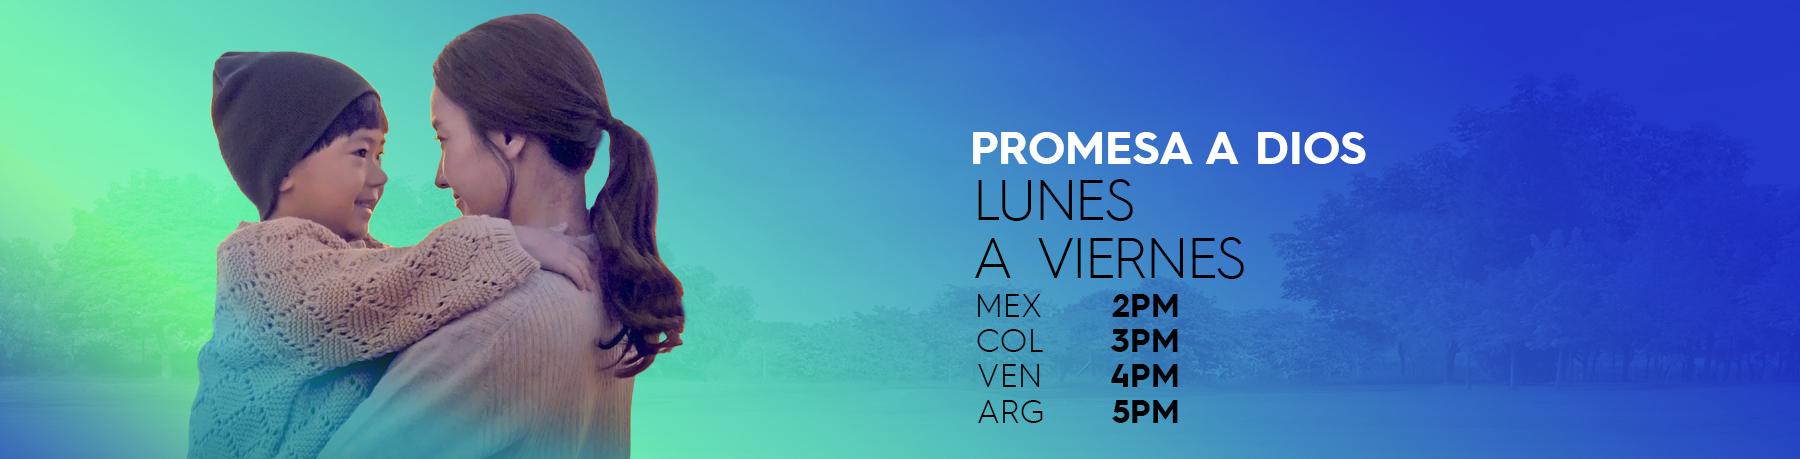 banner_promesa_a_dios_latam_1800x459px_hires